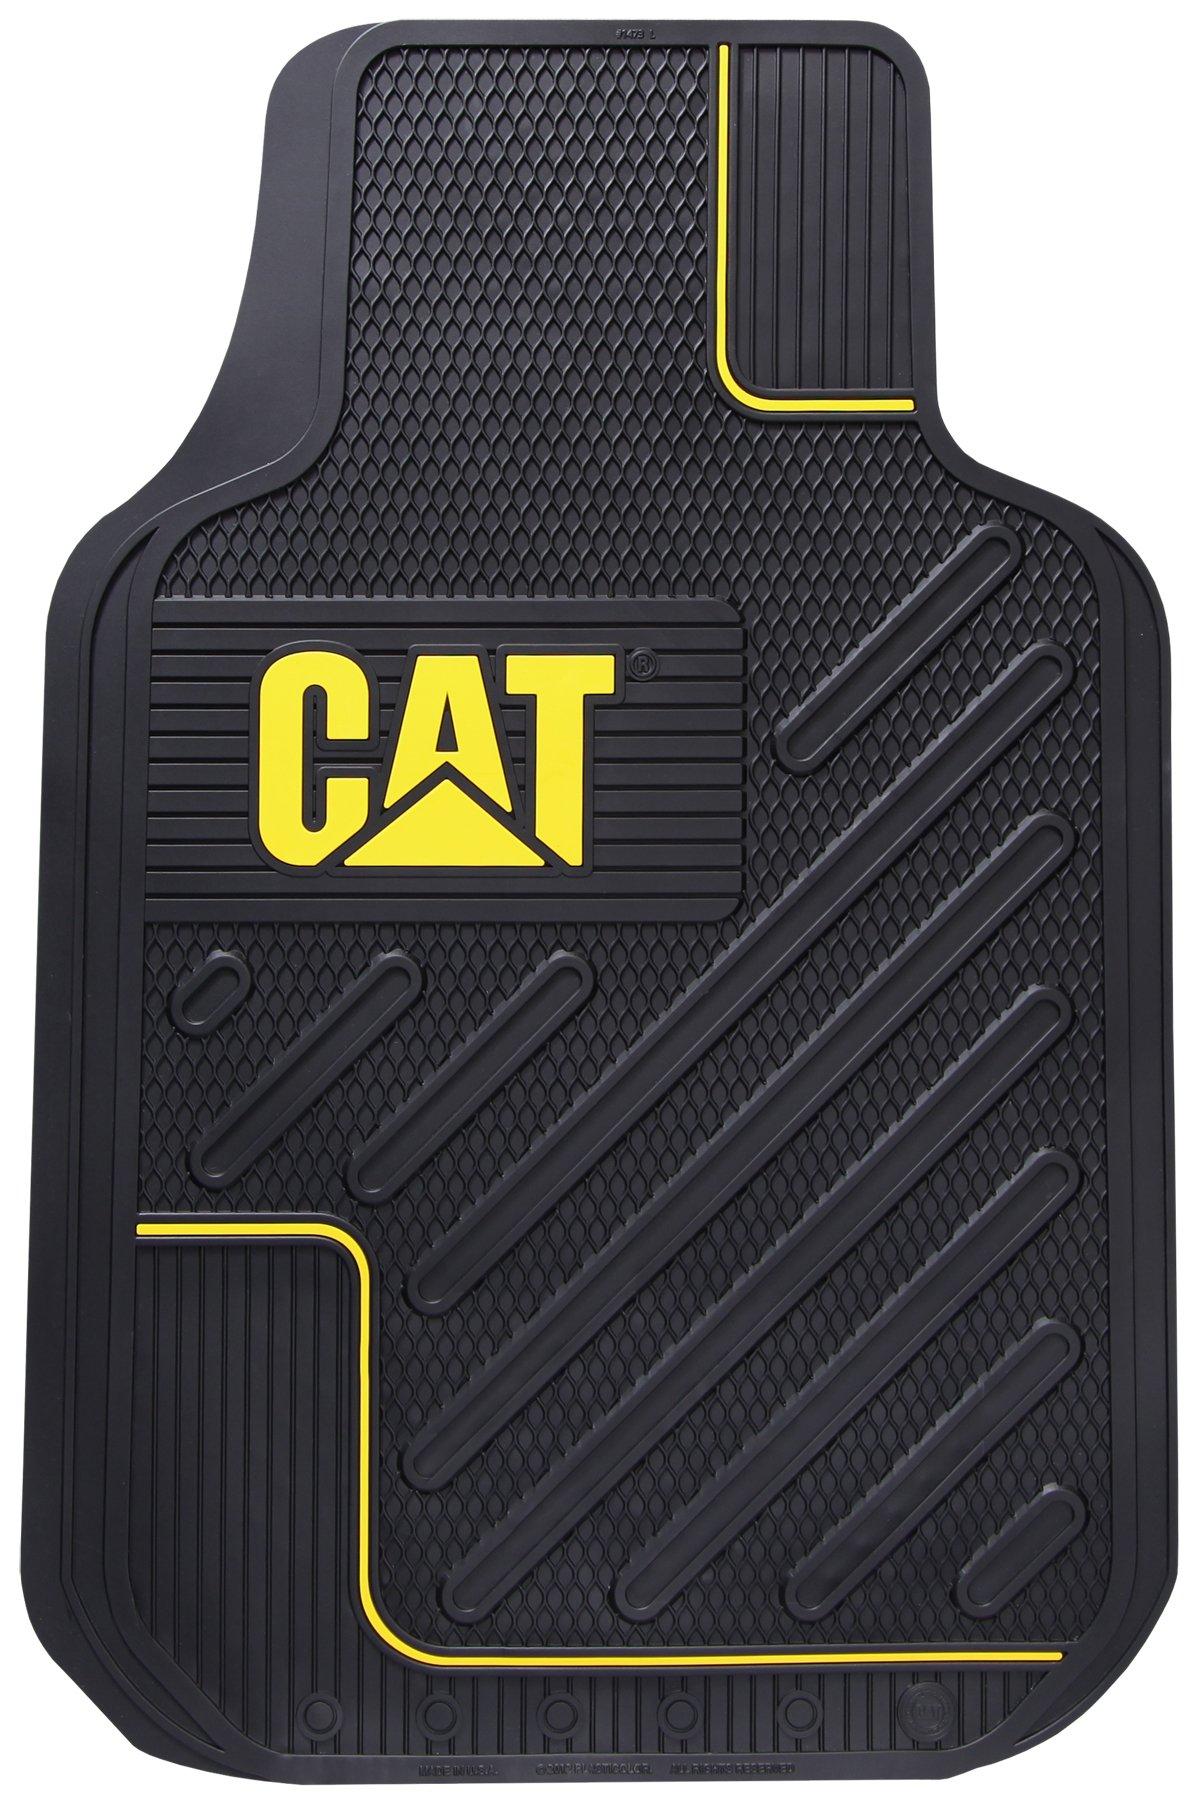 Caterpillar CAT All Weather Rubber Vinyl Front Floor Mats for Cars & Trucks